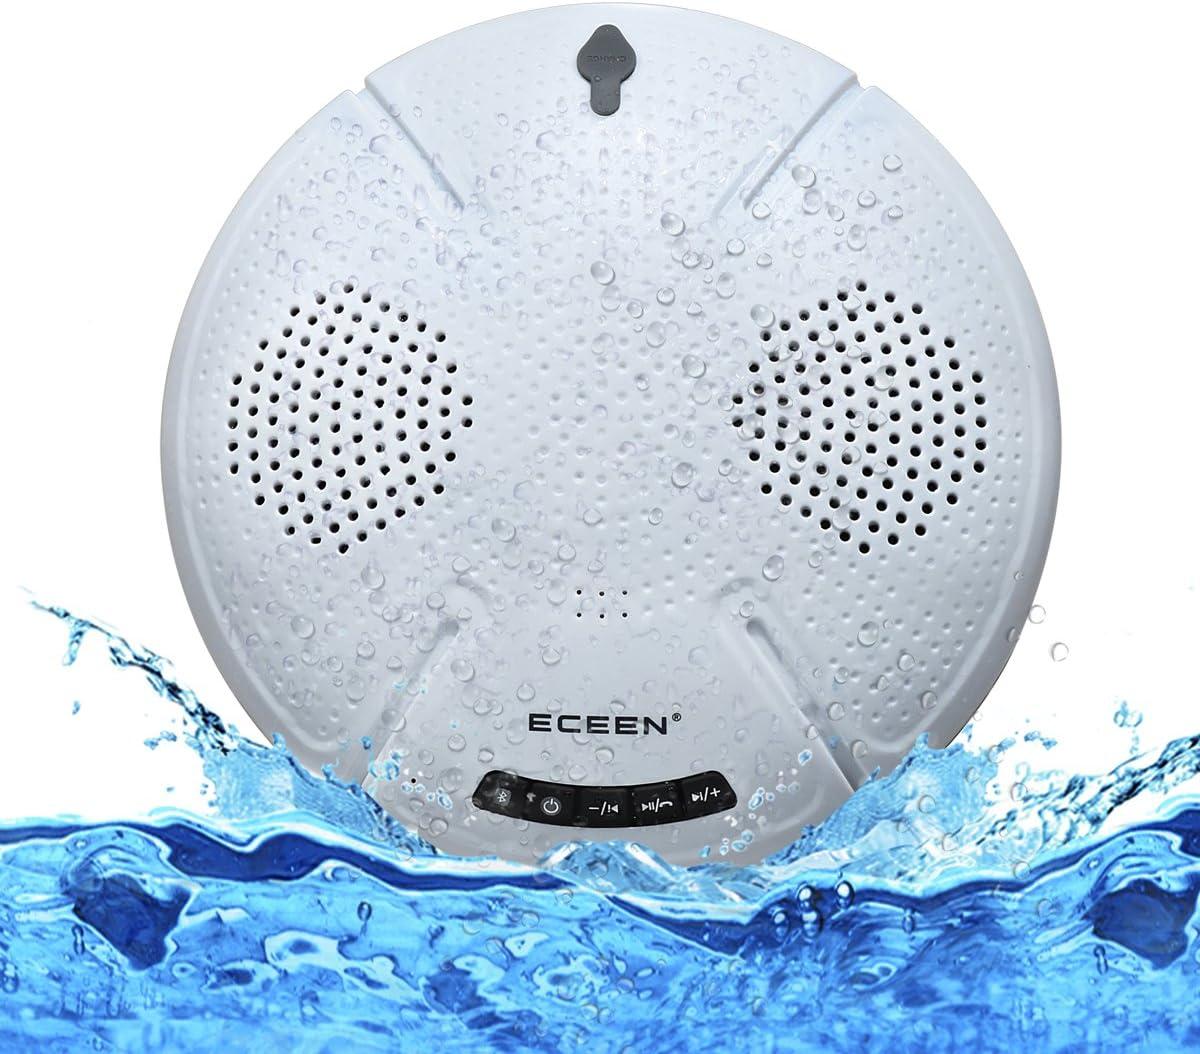 Bathroom Car Home Beach Shower-IPX7 Dual 5W Audio Drives Boat ECEEN Swimming Speaker Pool Floating Speakers Wireless Waterproof Stereo Splashproof Shockproof Dustproof for Outdoor